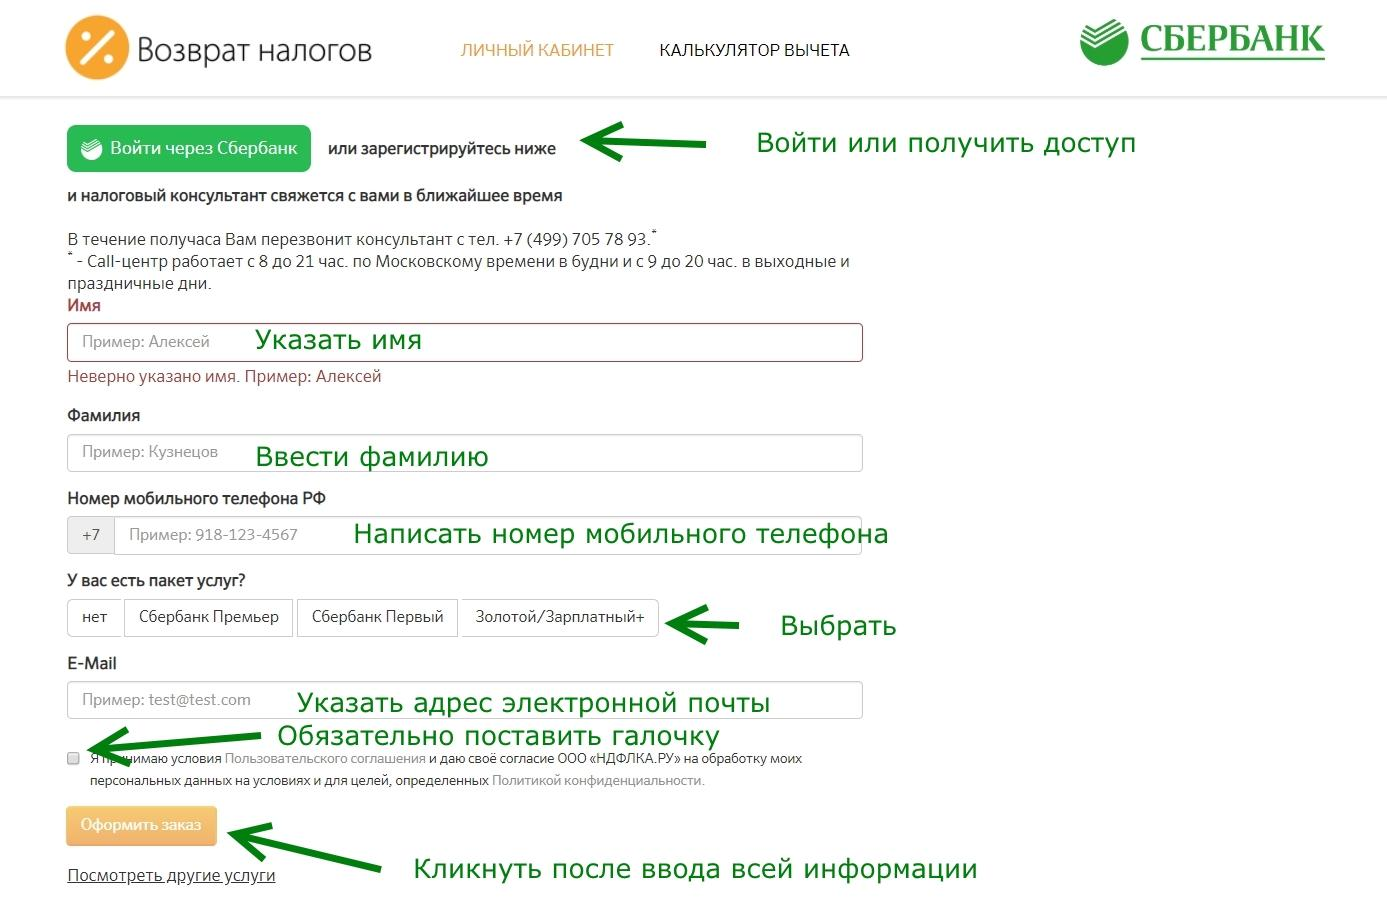 C:\Users\Лена\Desktop\заявка на возврат налога.jpg